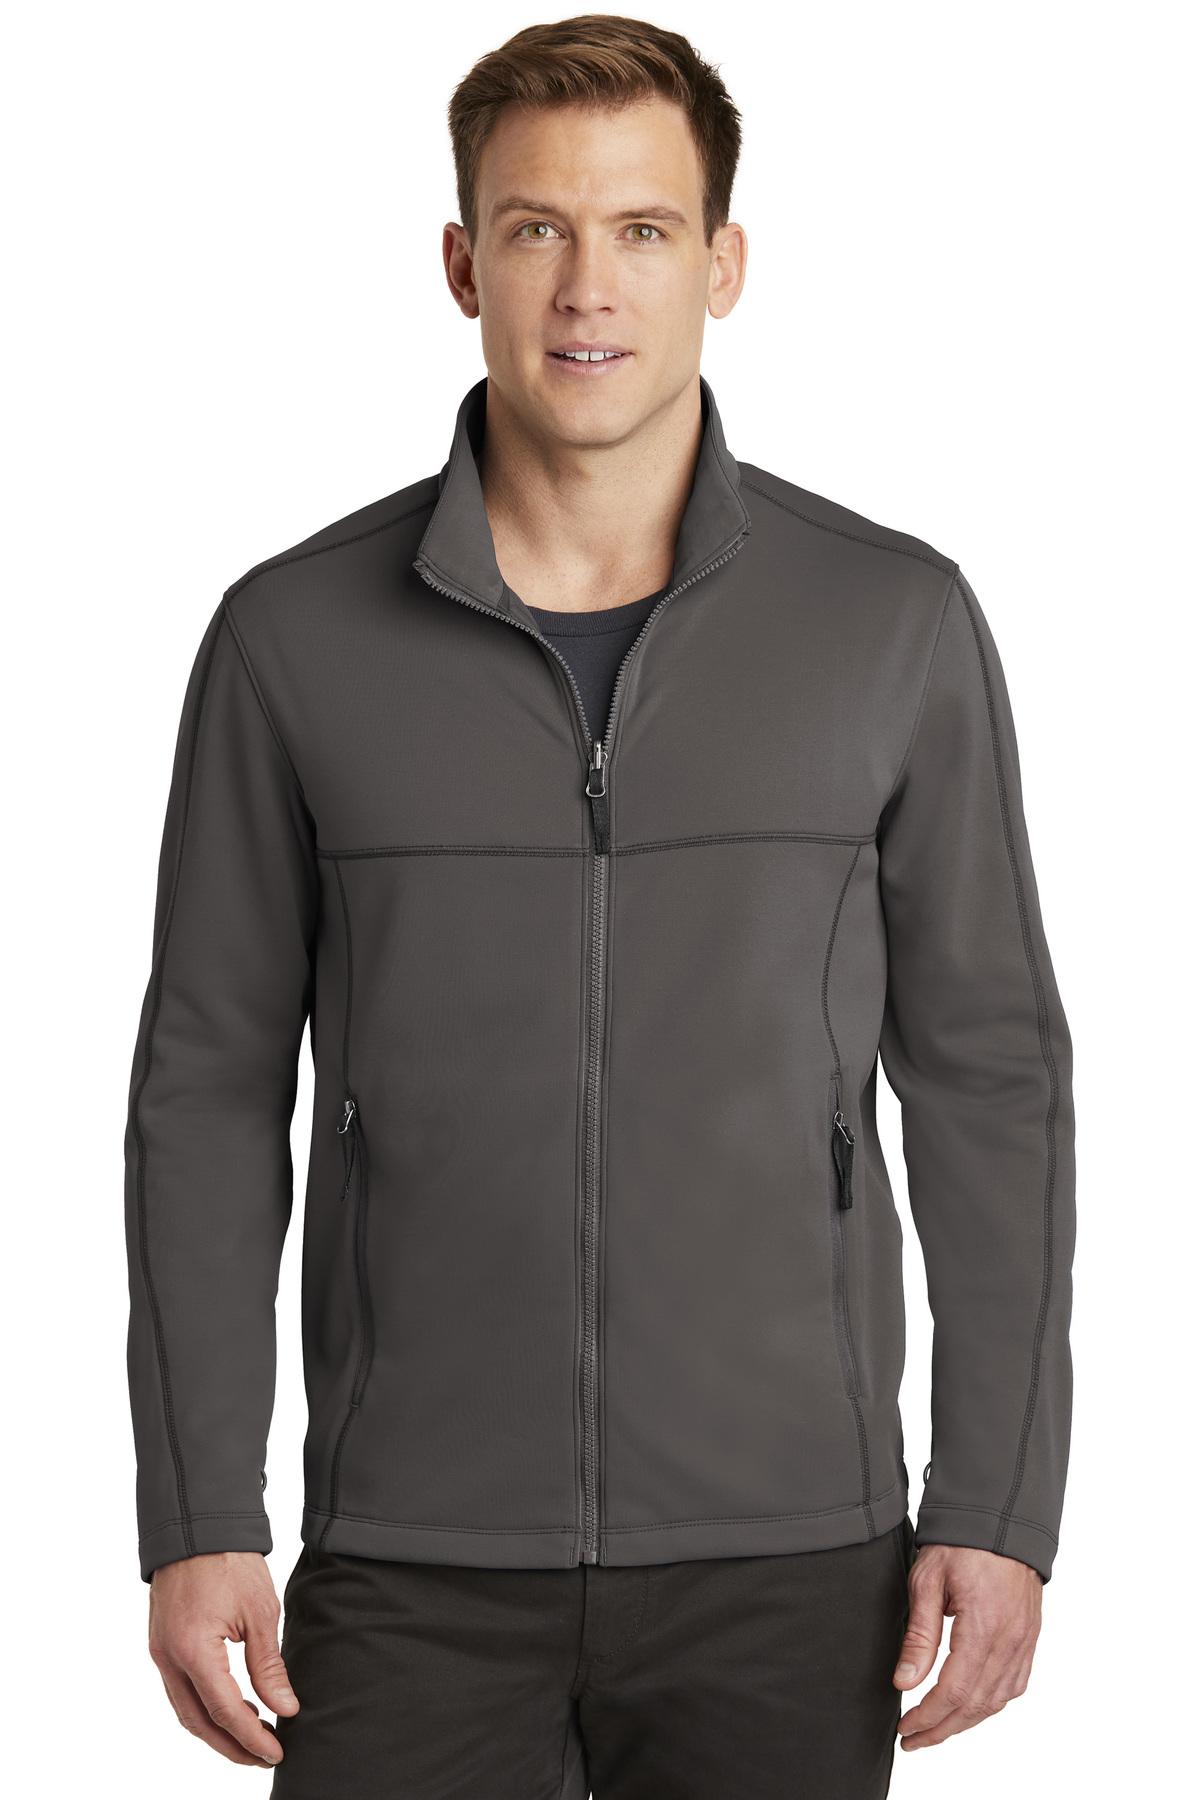 fd1ef6ade1f6 Port Authority ® Collective Smooth Fleece Jacket